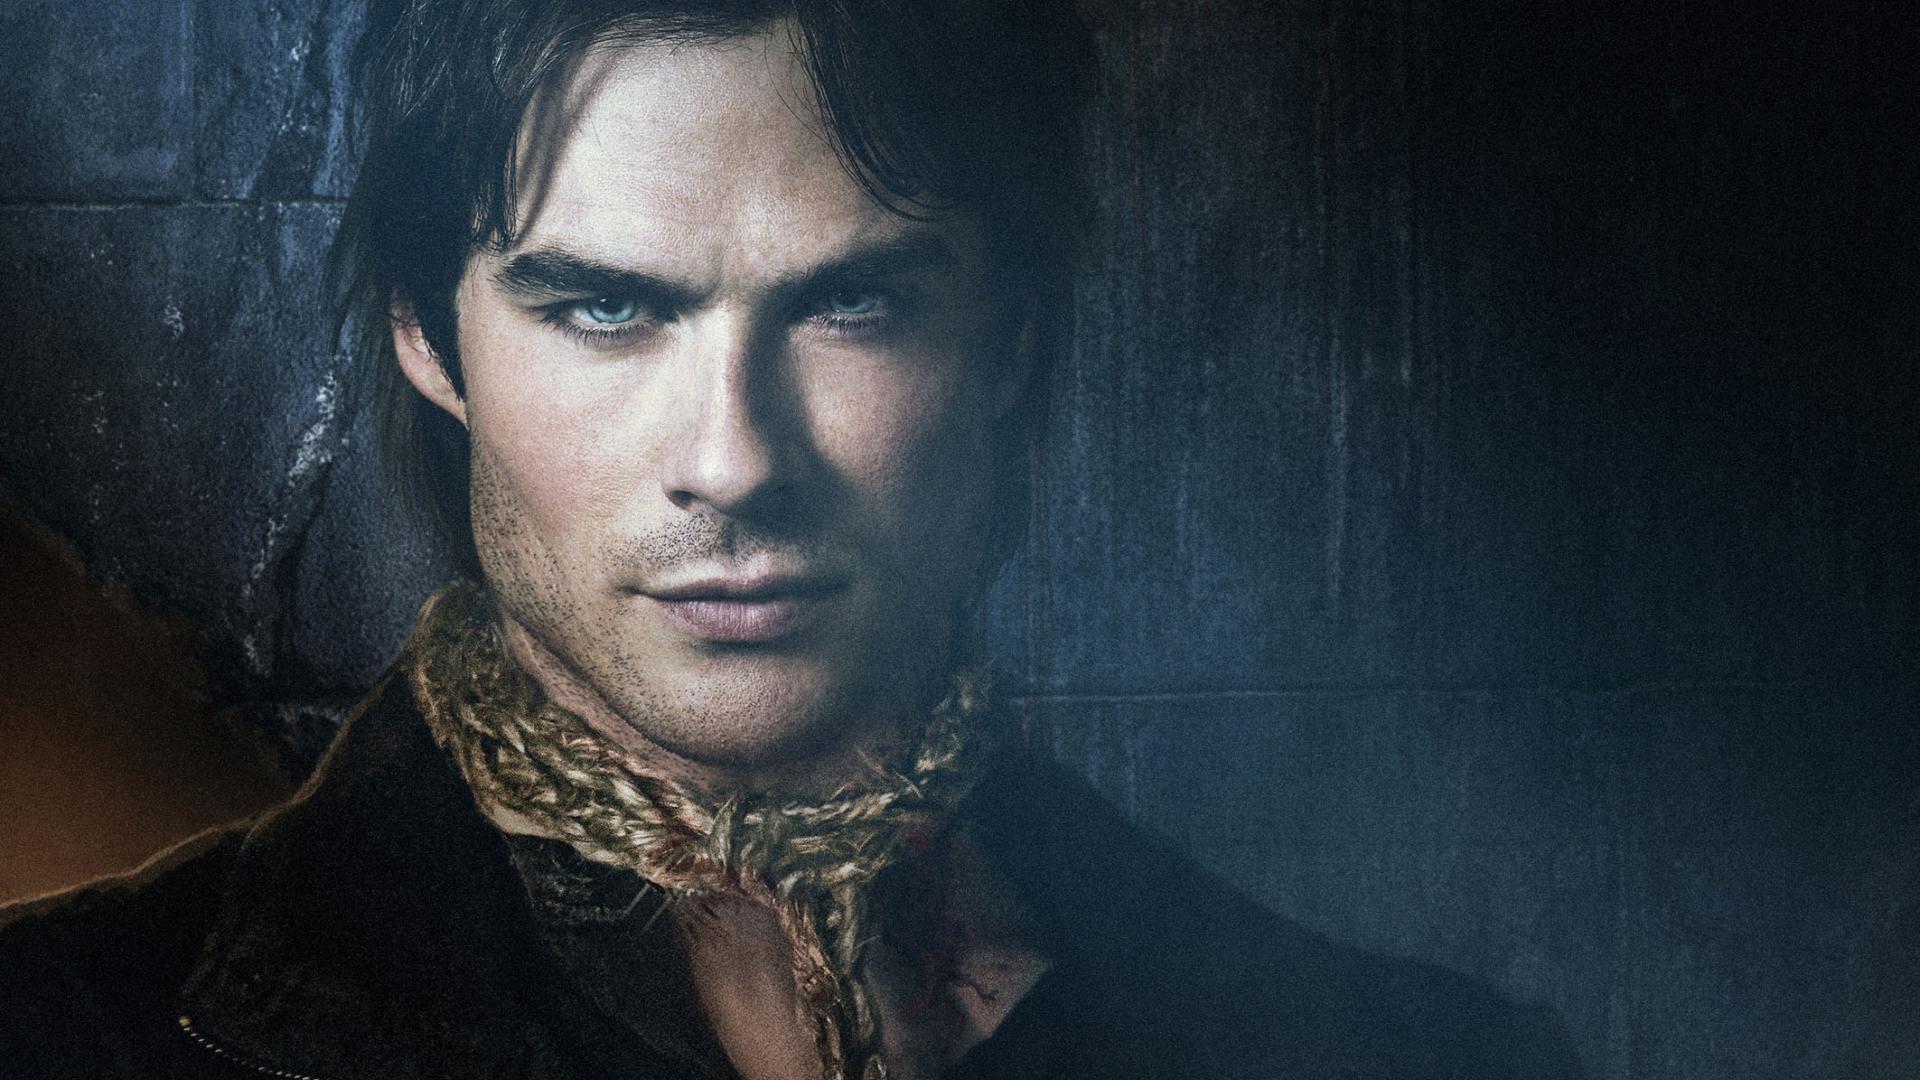 Free Download Wallpaper The Vampire Diaries Movies Ian Somerhalder